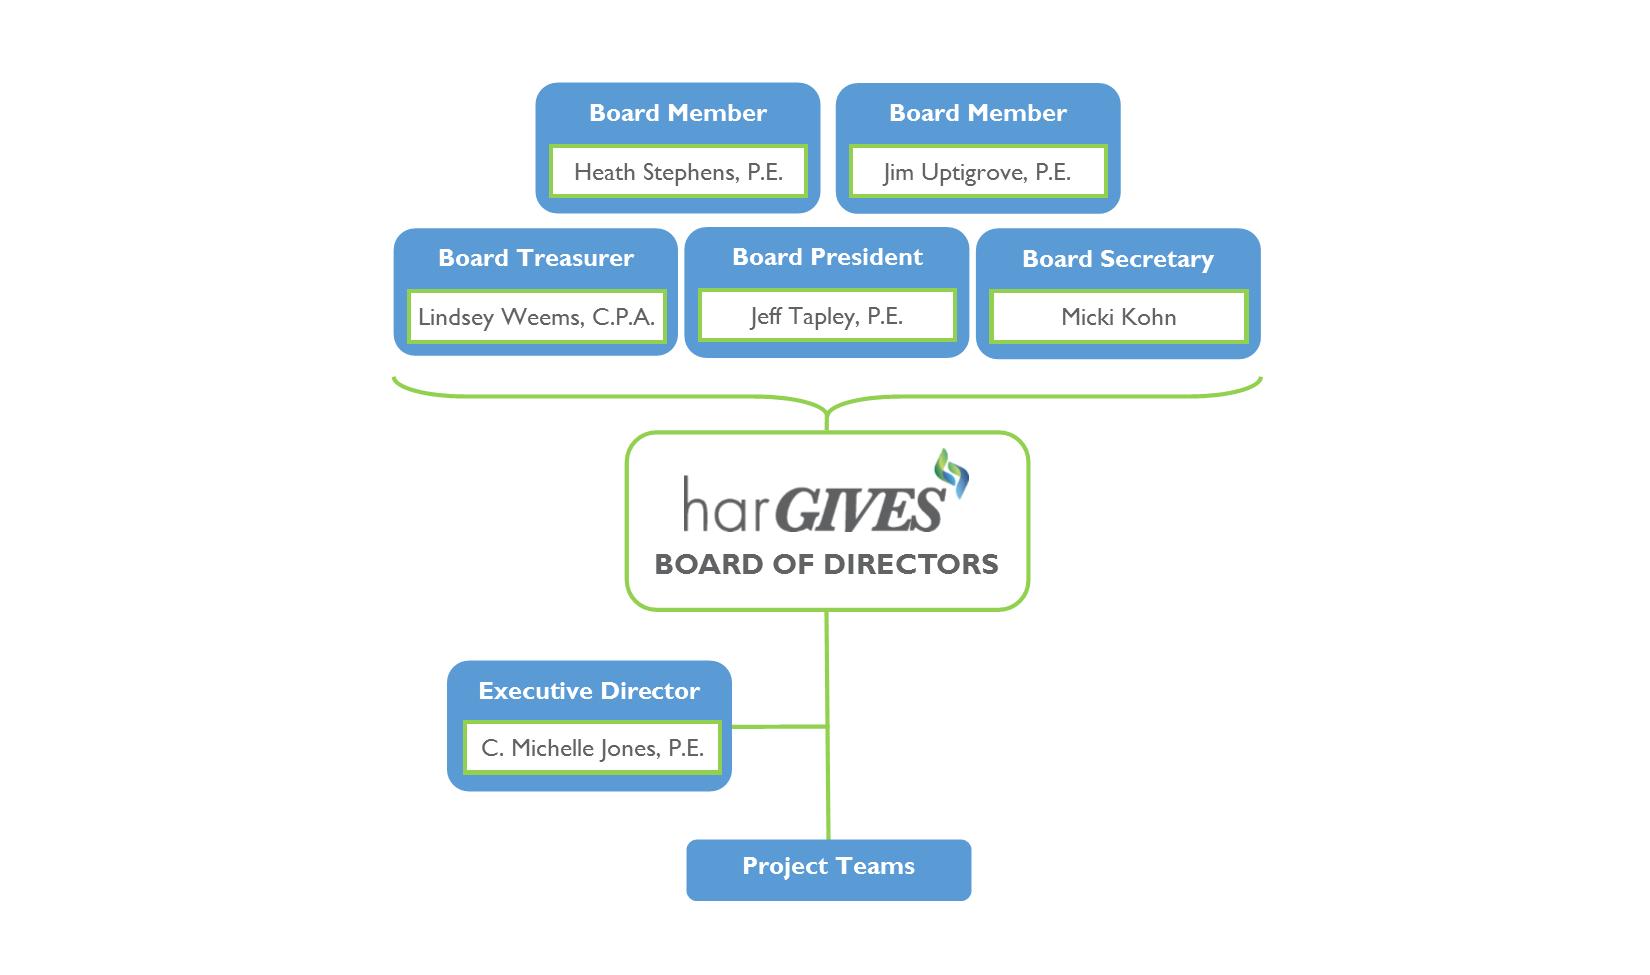 har GIVES  organizational chart.